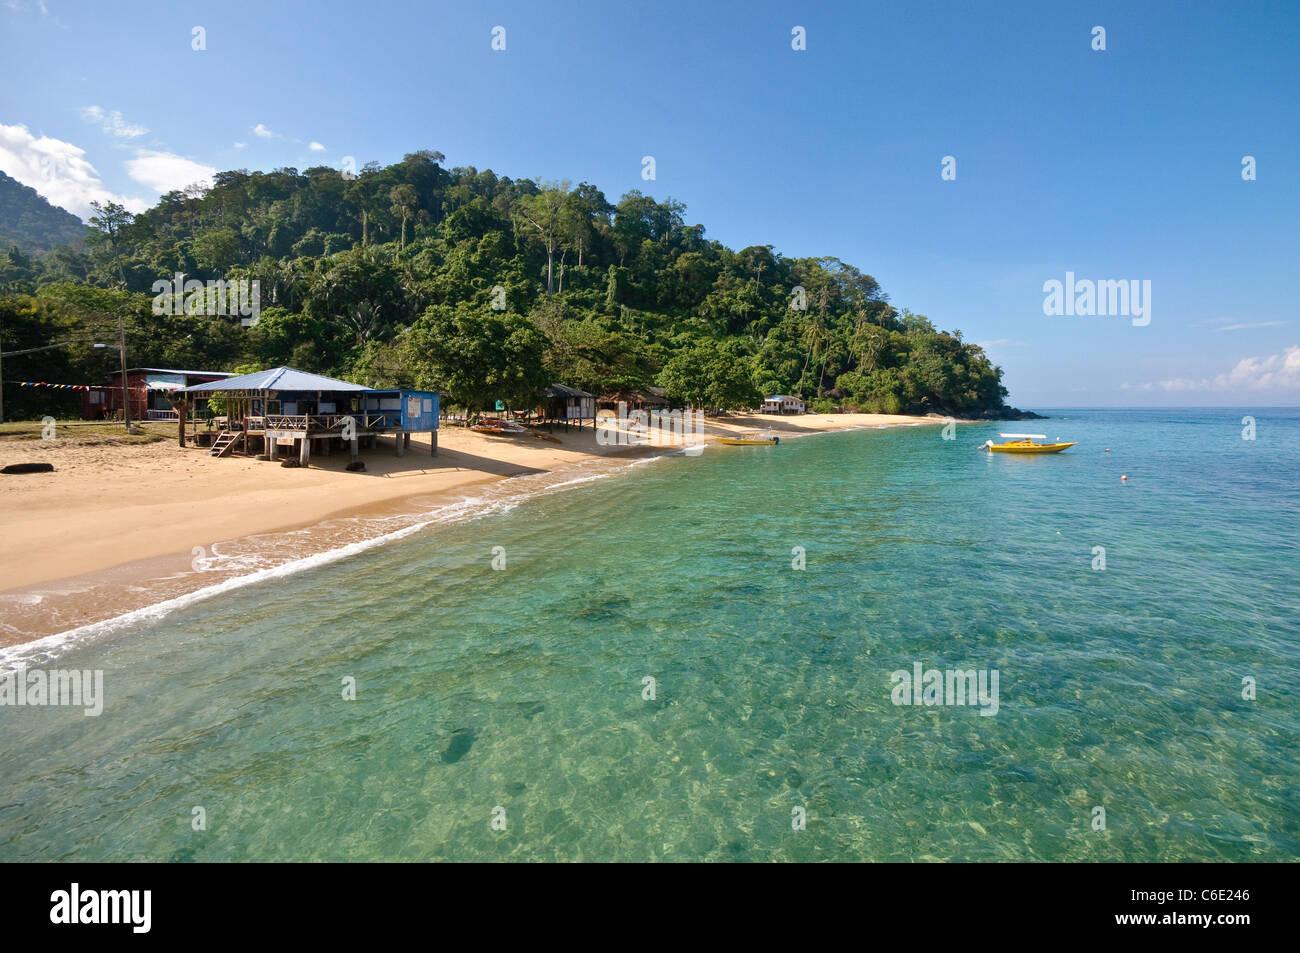 Huts on the beach of Paya, Pulau Tioman Island, Malaysia, Southeast Asia, Asia Stock Photo